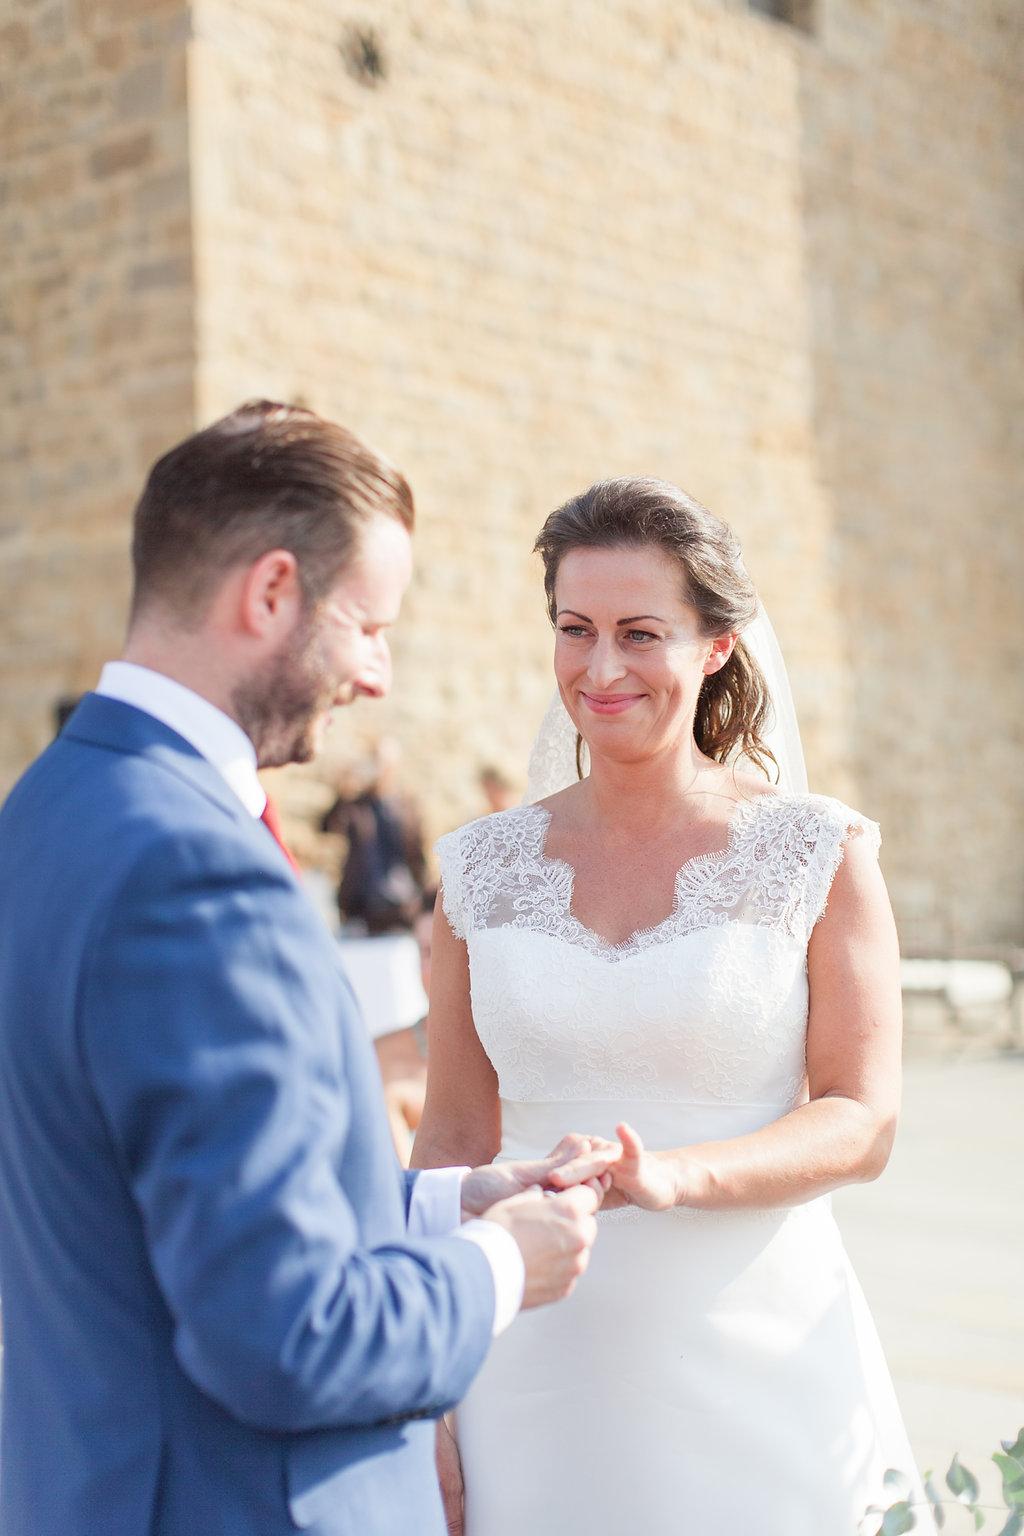 castelfalfi-tuscany-wedding-photographer-roberta-facchini-194